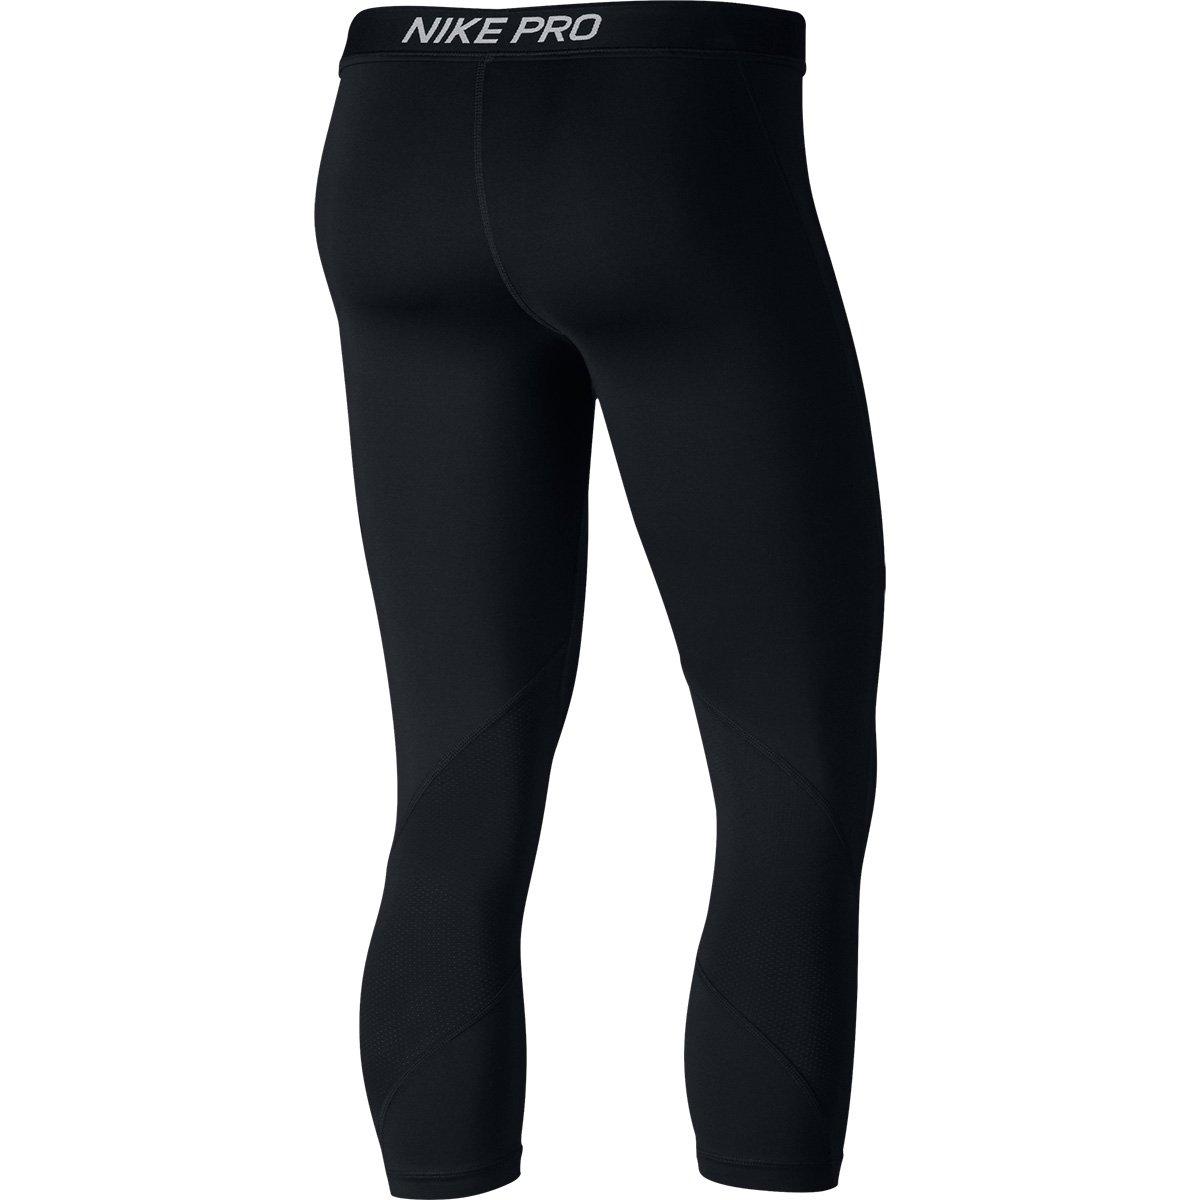 Nike Pro Calça Feminina e Calça Branco Capri Capri Preto xIqat1AB